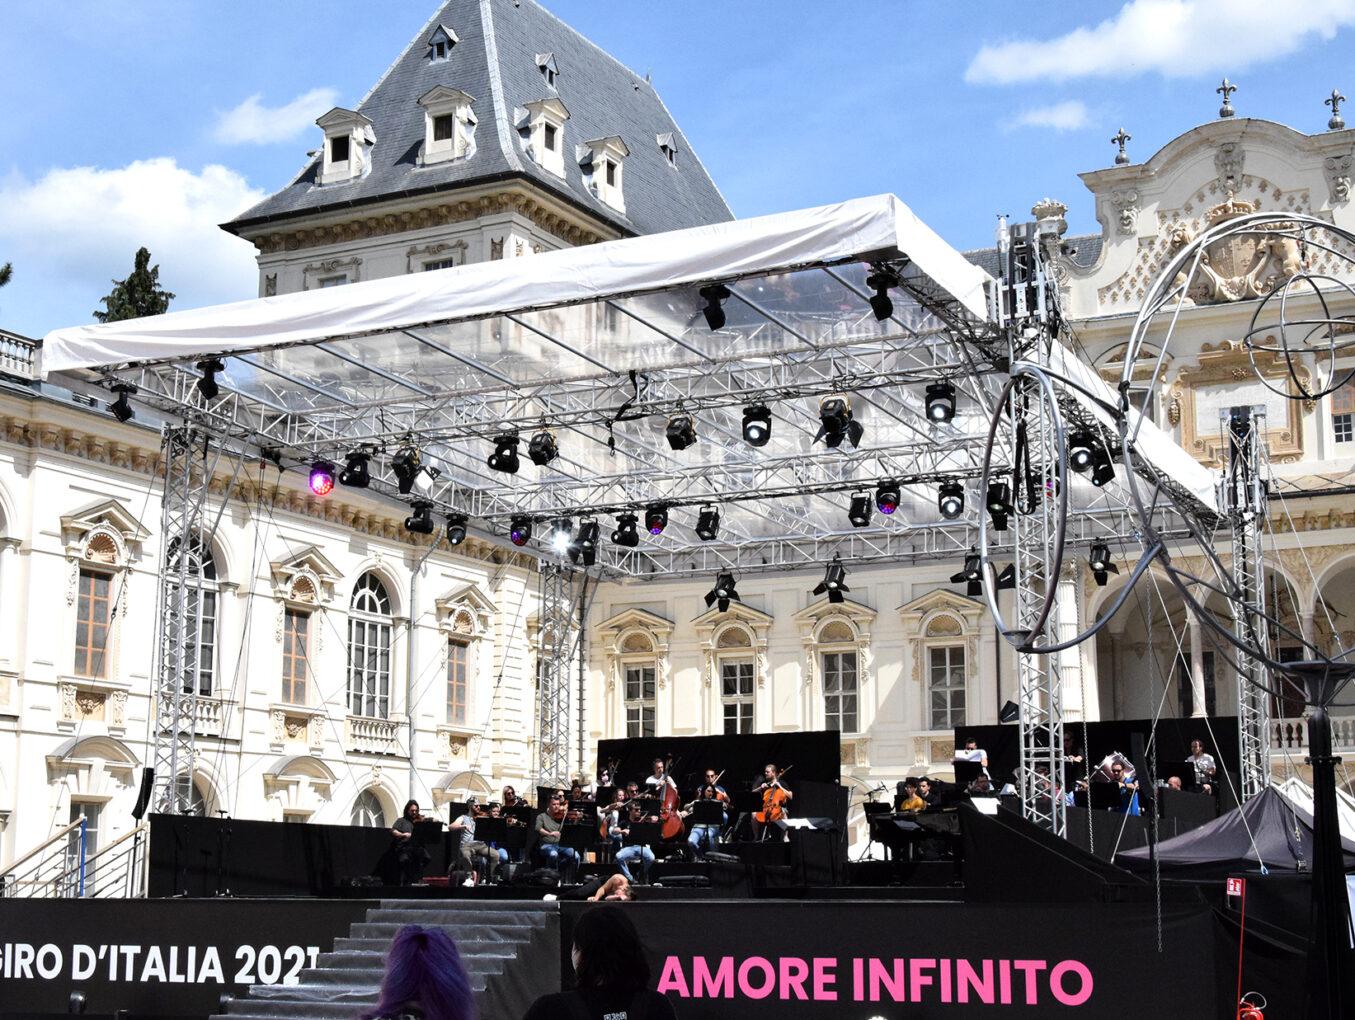 Giro d'Italia 2021 con ROBE e Robert Juliat